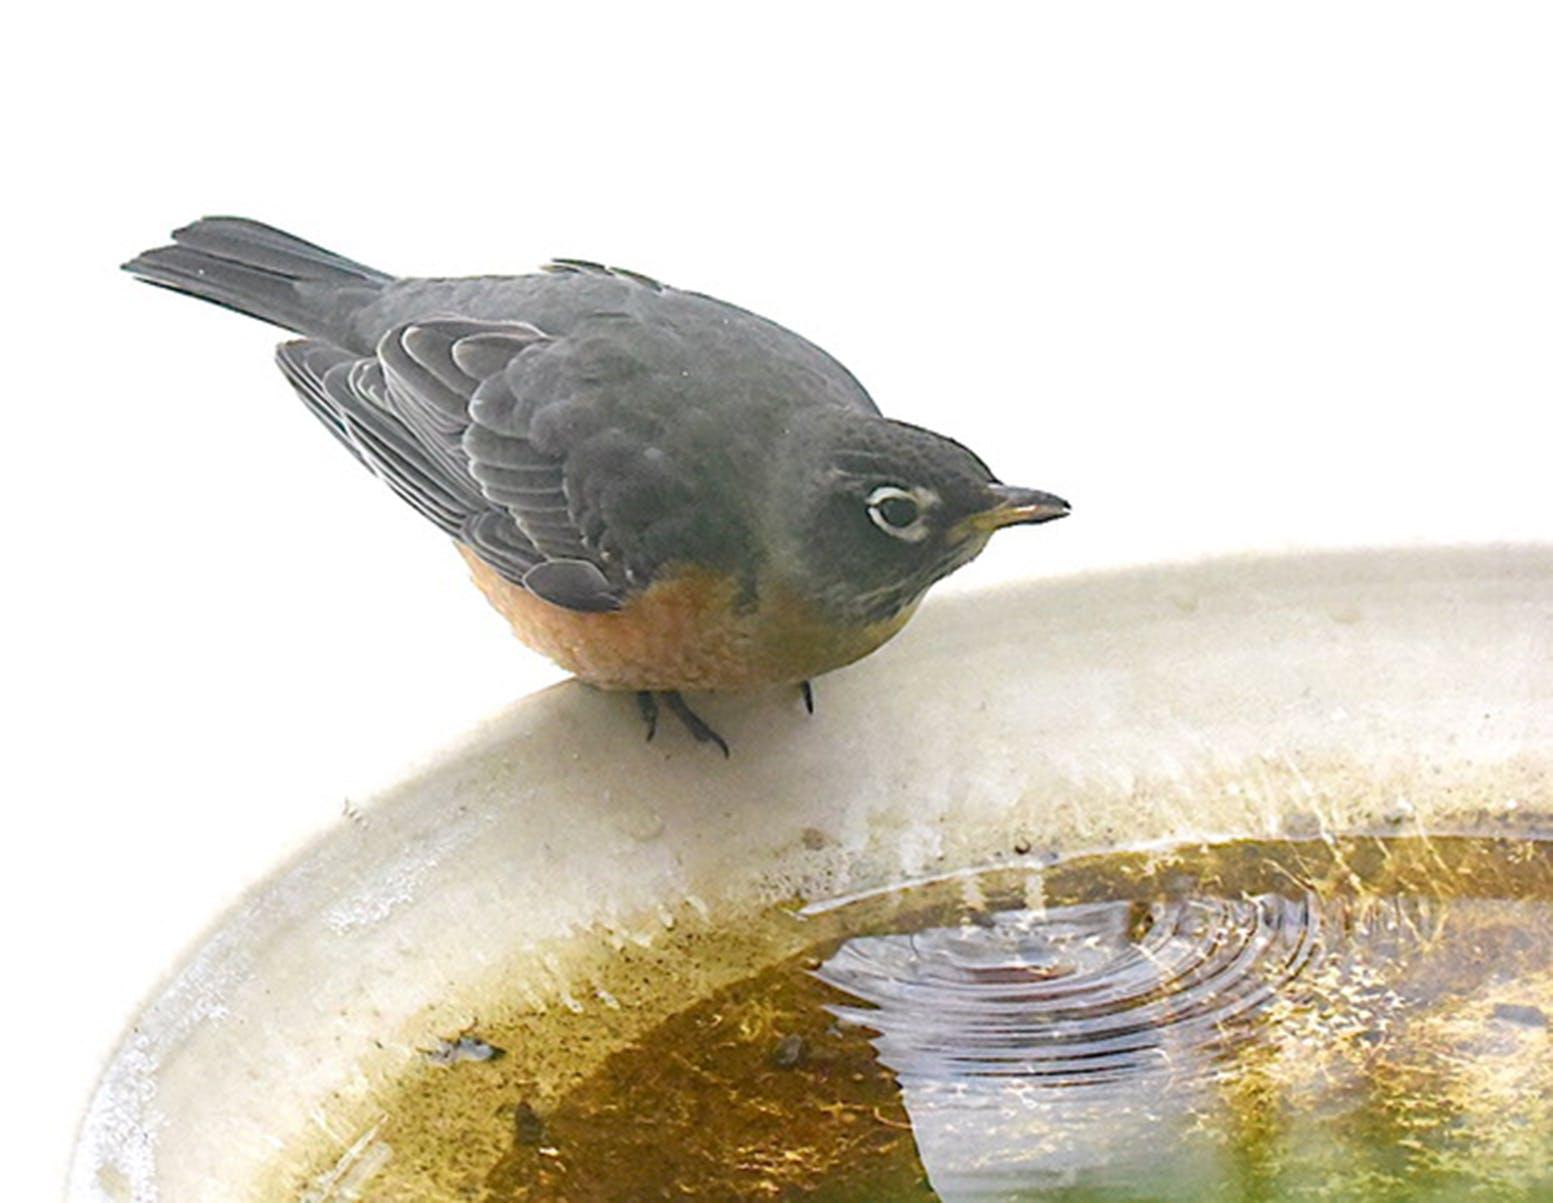 Add more robins and the birdbath gets messy.